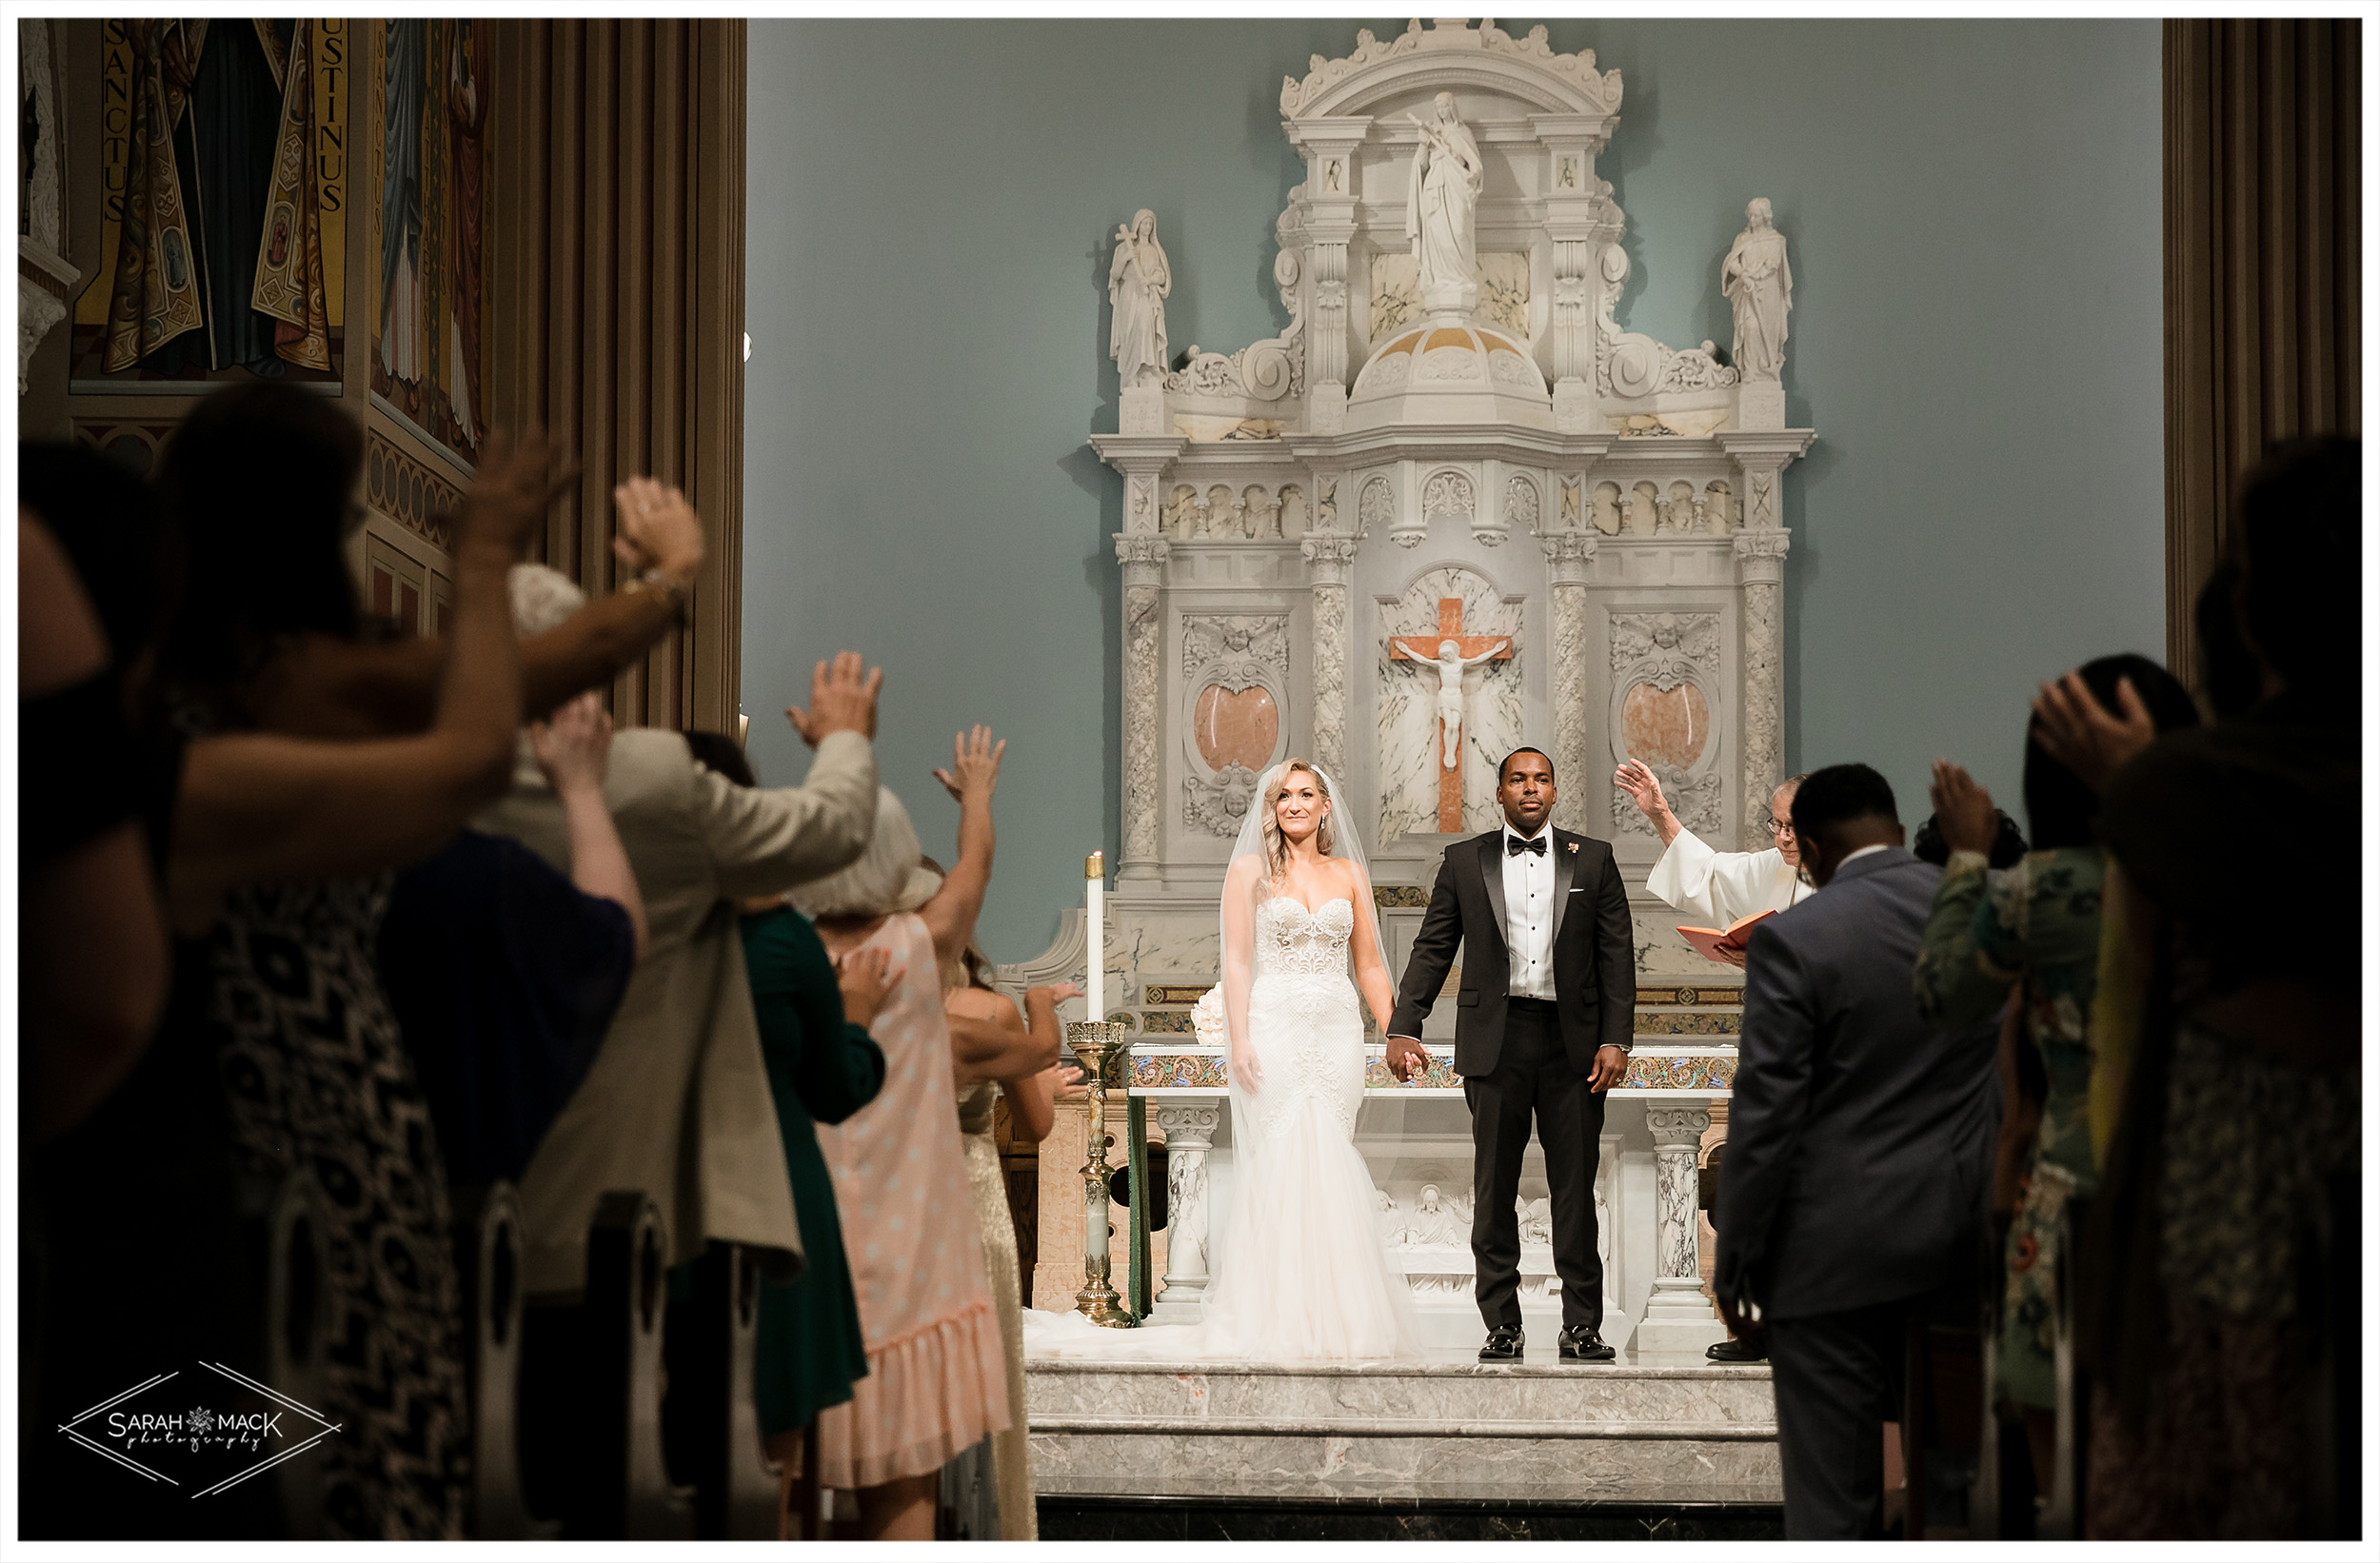 MK-Santa-Monica-Catholic-Church-Wedding-Photography-27.jpg